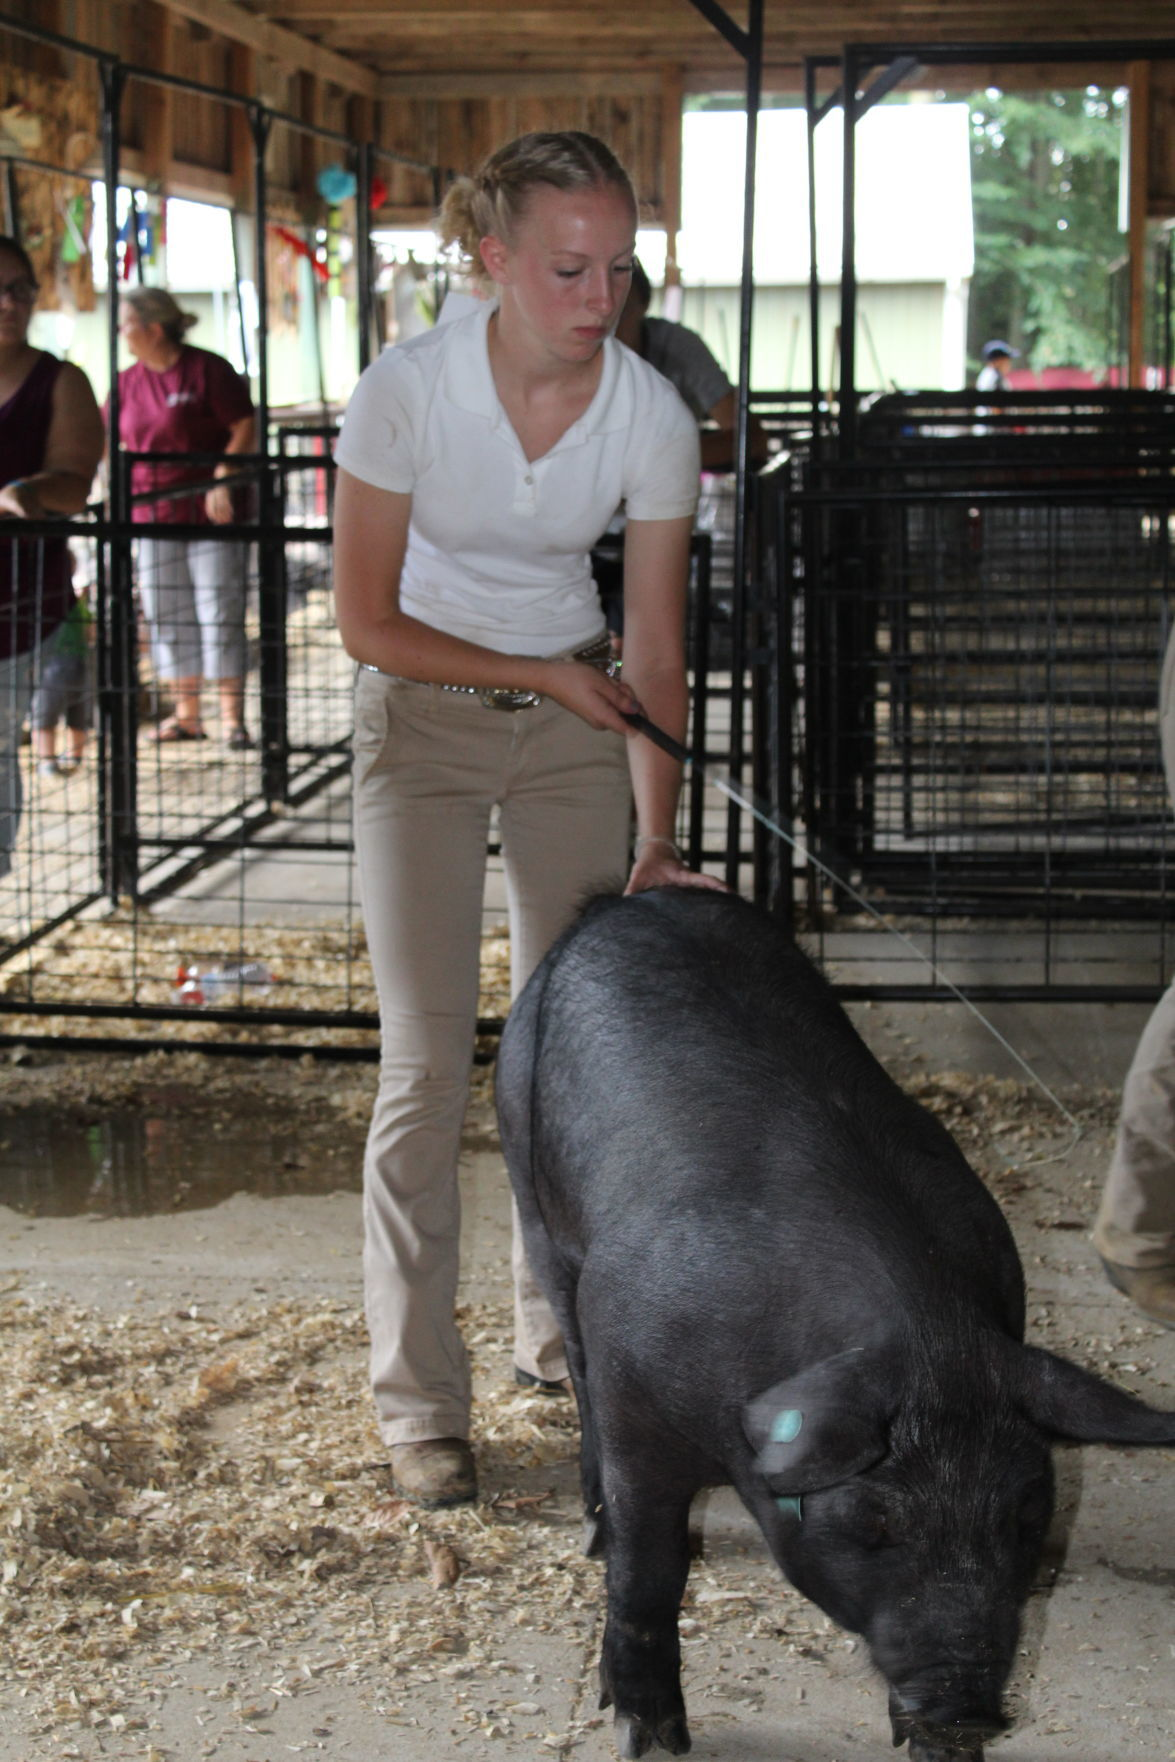 Saathoff snags 4-H Elite livestock show title